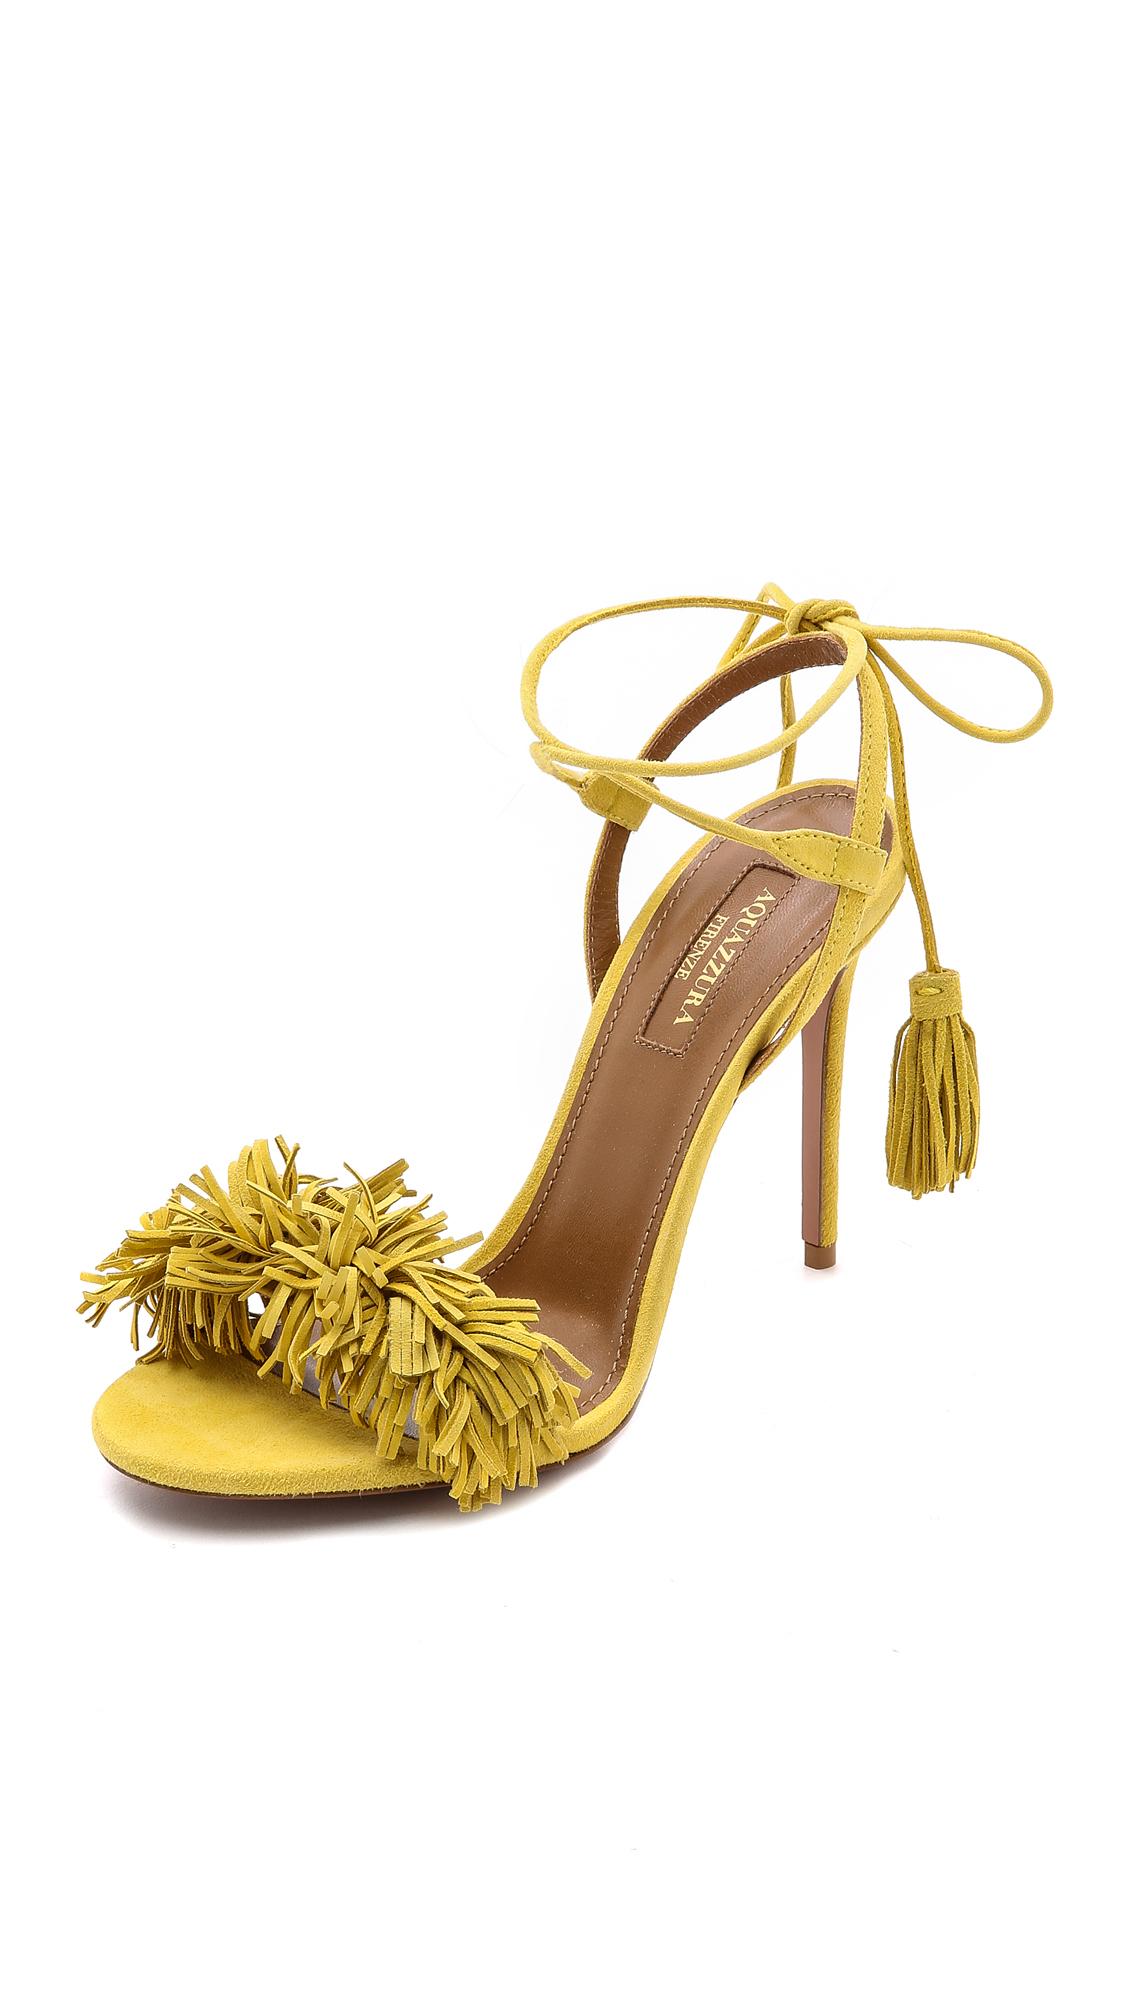 be9743987d5 Aquazzura Wild Thing Fringe Sandals - Tulip Yellow in Yellow - Lyst